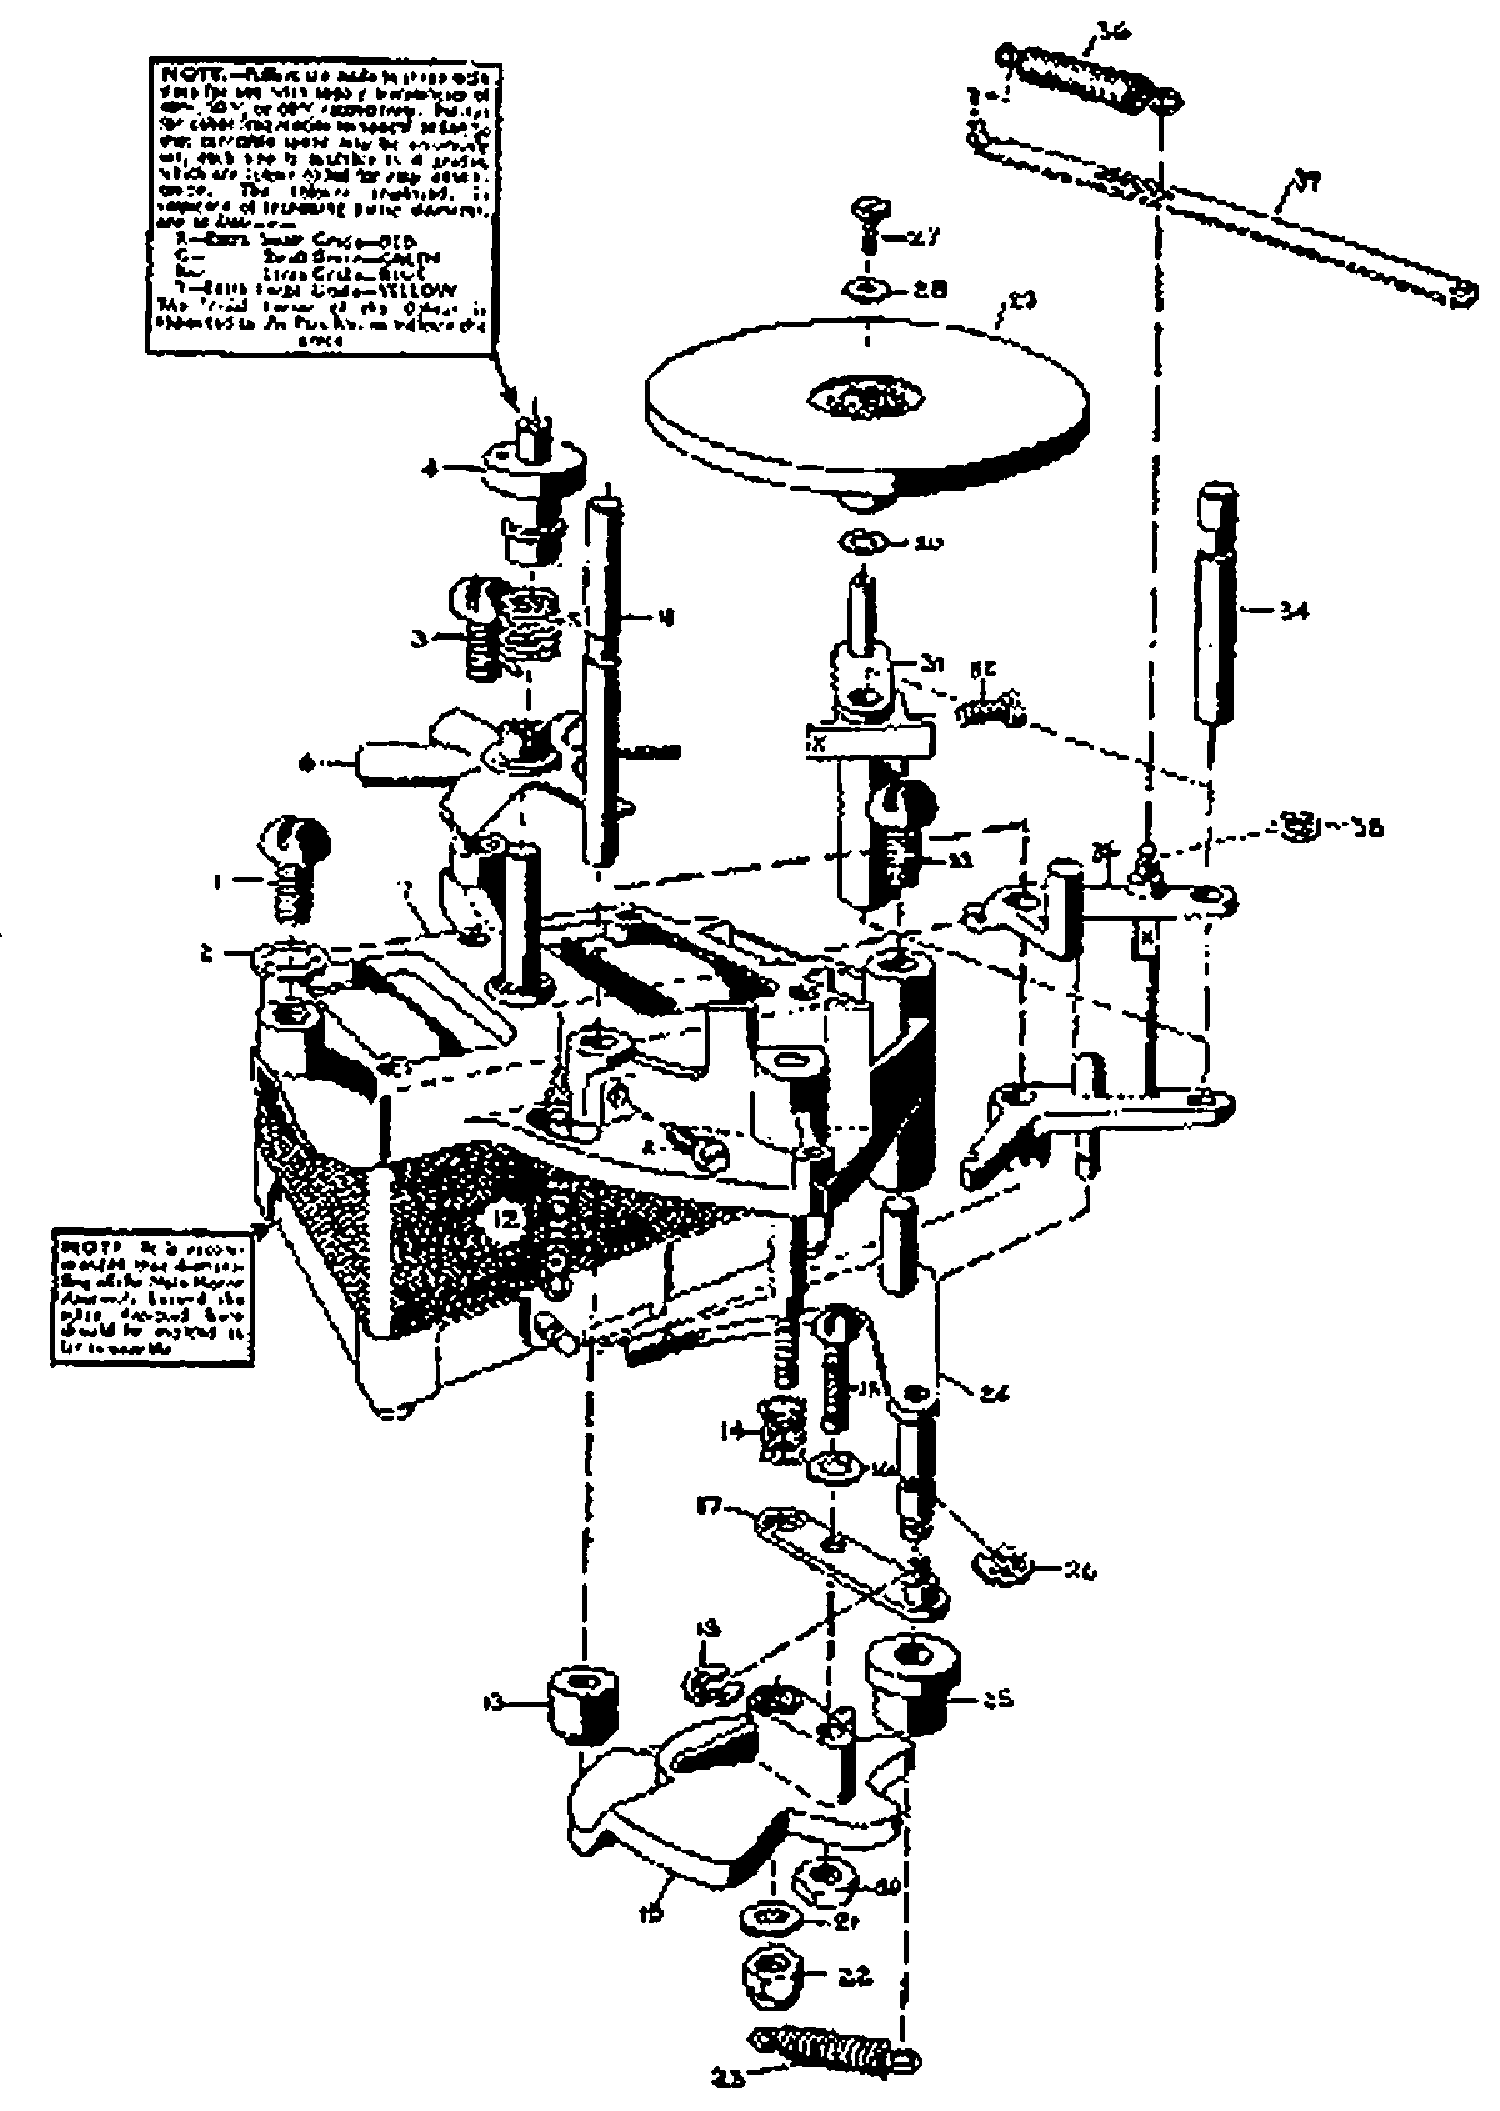 collaro microgram phonograph service manual download